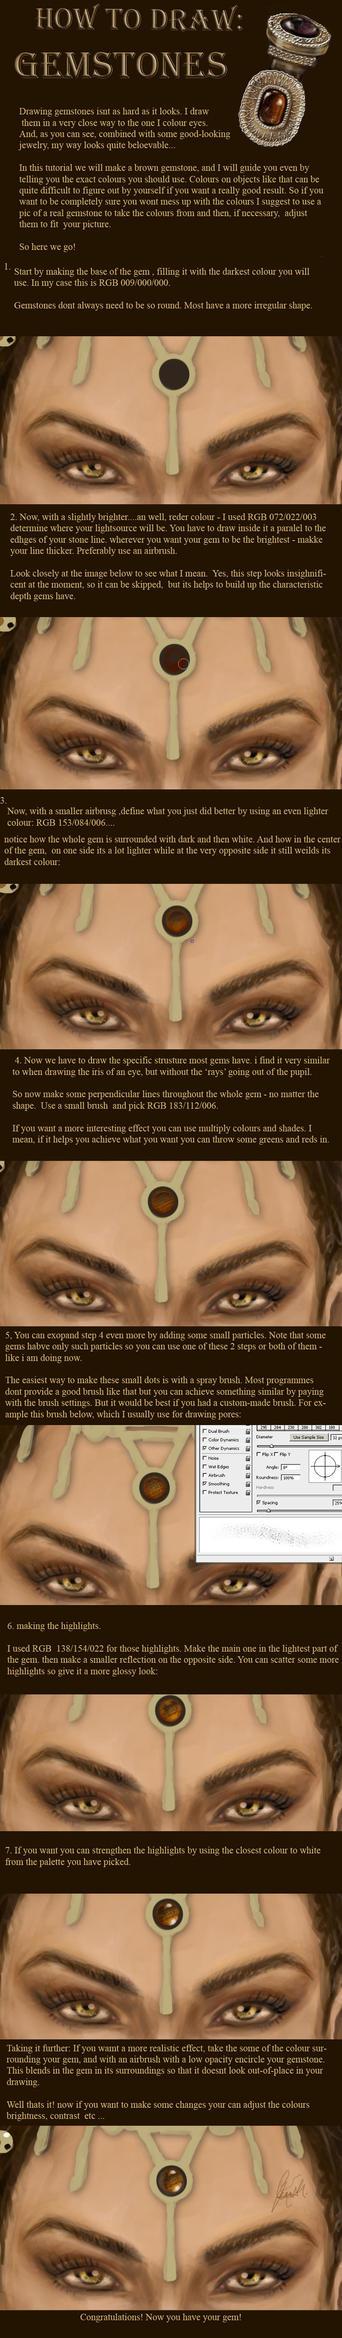 How to Draw: GEMSTONES by NightWish666